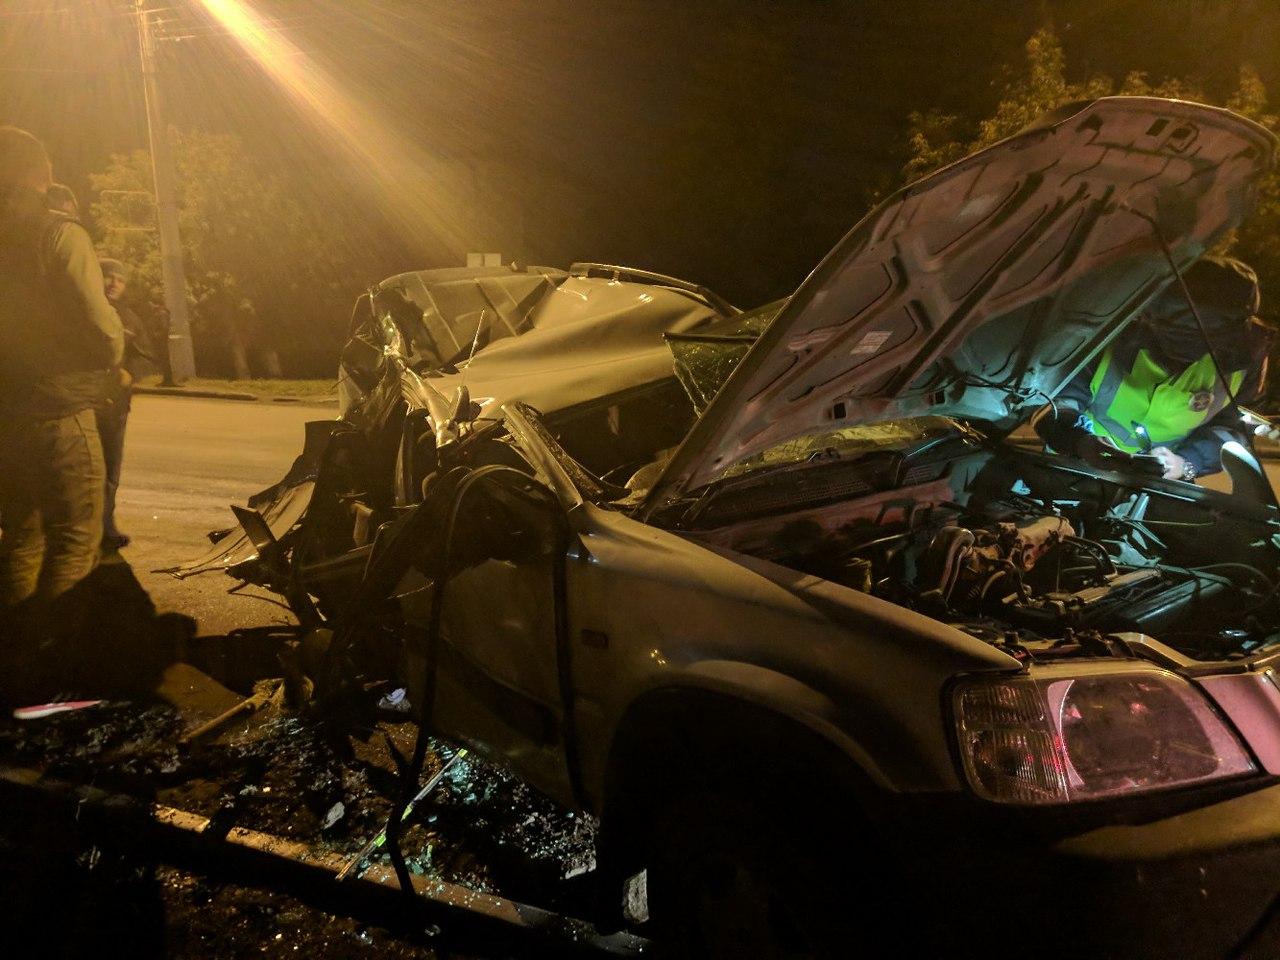 ДТП в Омске: иномарку от удара в столб разорвало на две части